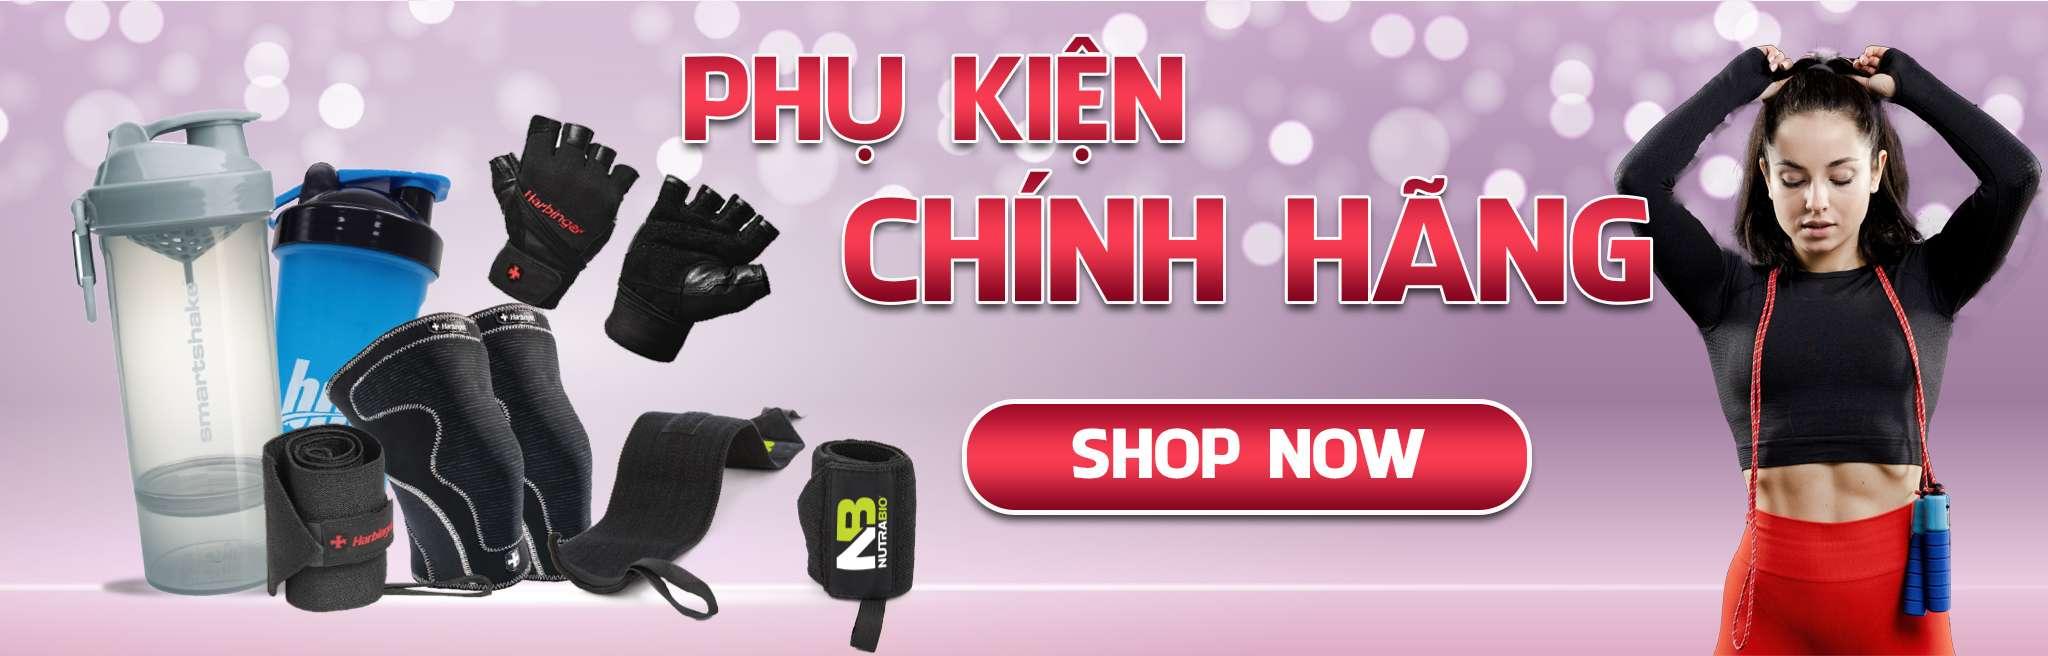 baner phu kien chinh hang wheyshop